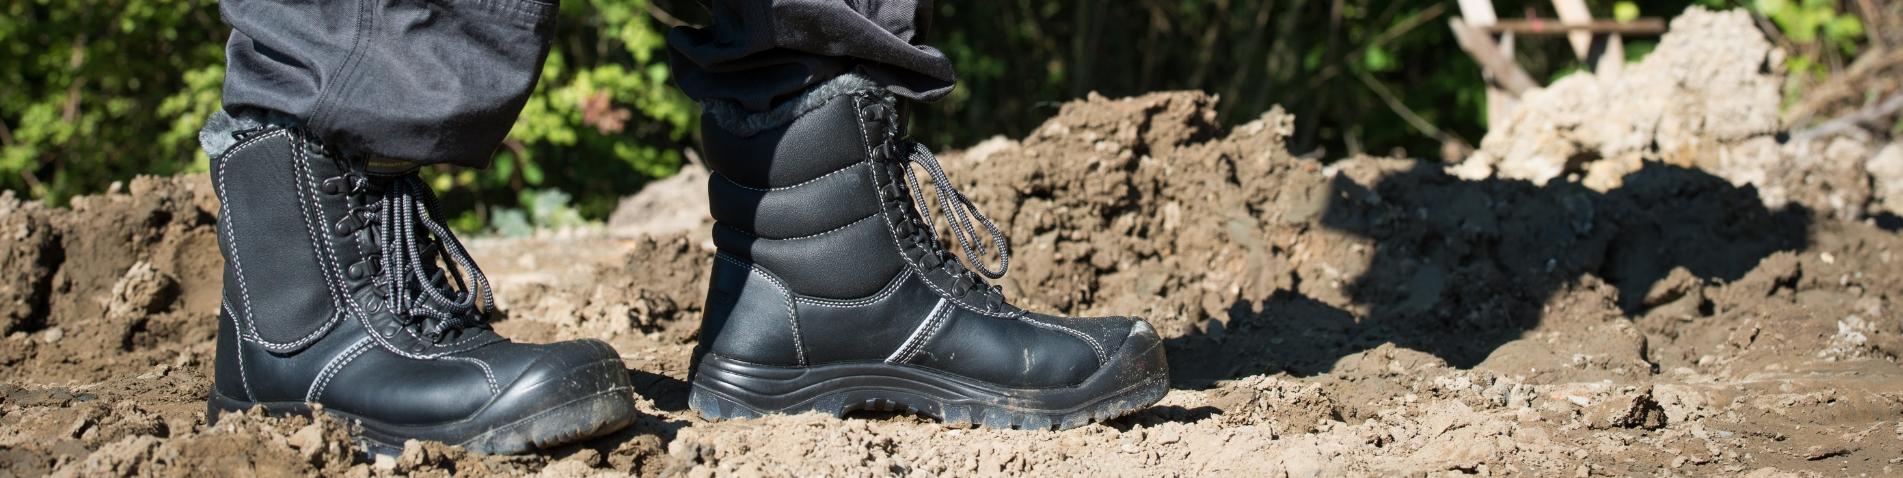 workwear4all-be -  Veiligheidslaarzen banner breed